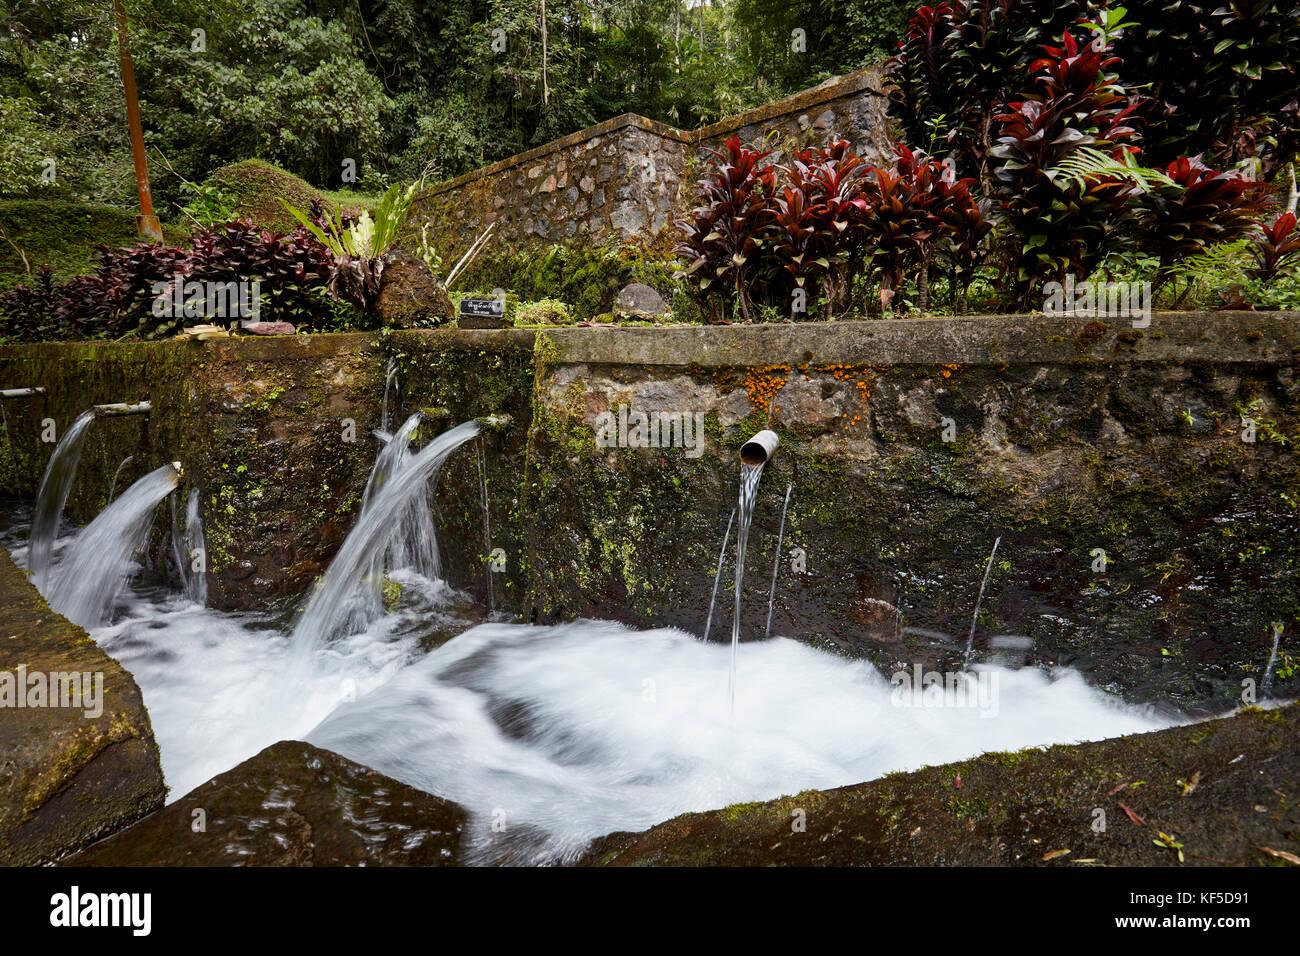 Los manantiales de agua en el templo mengening. tampaksiring, Bali, Indonesia. Imagen De Stock